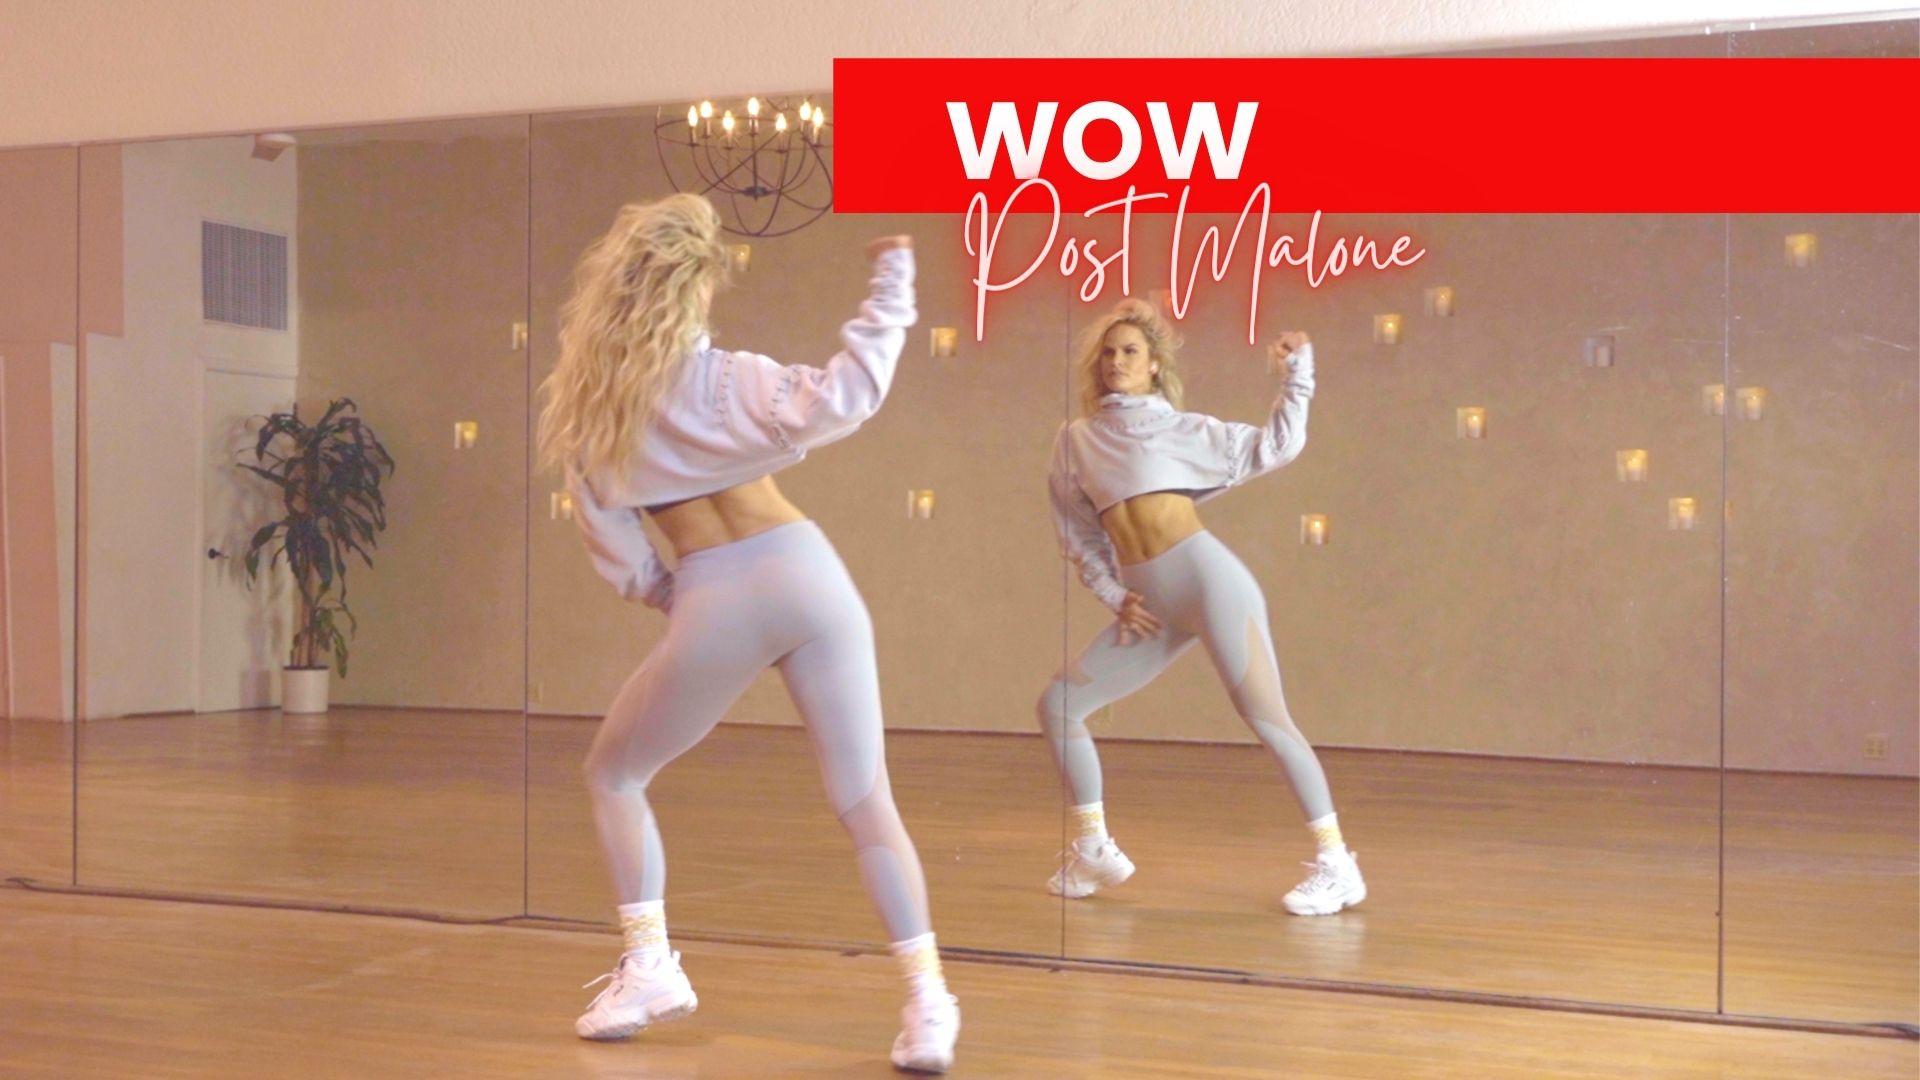 wow post malone dance routine